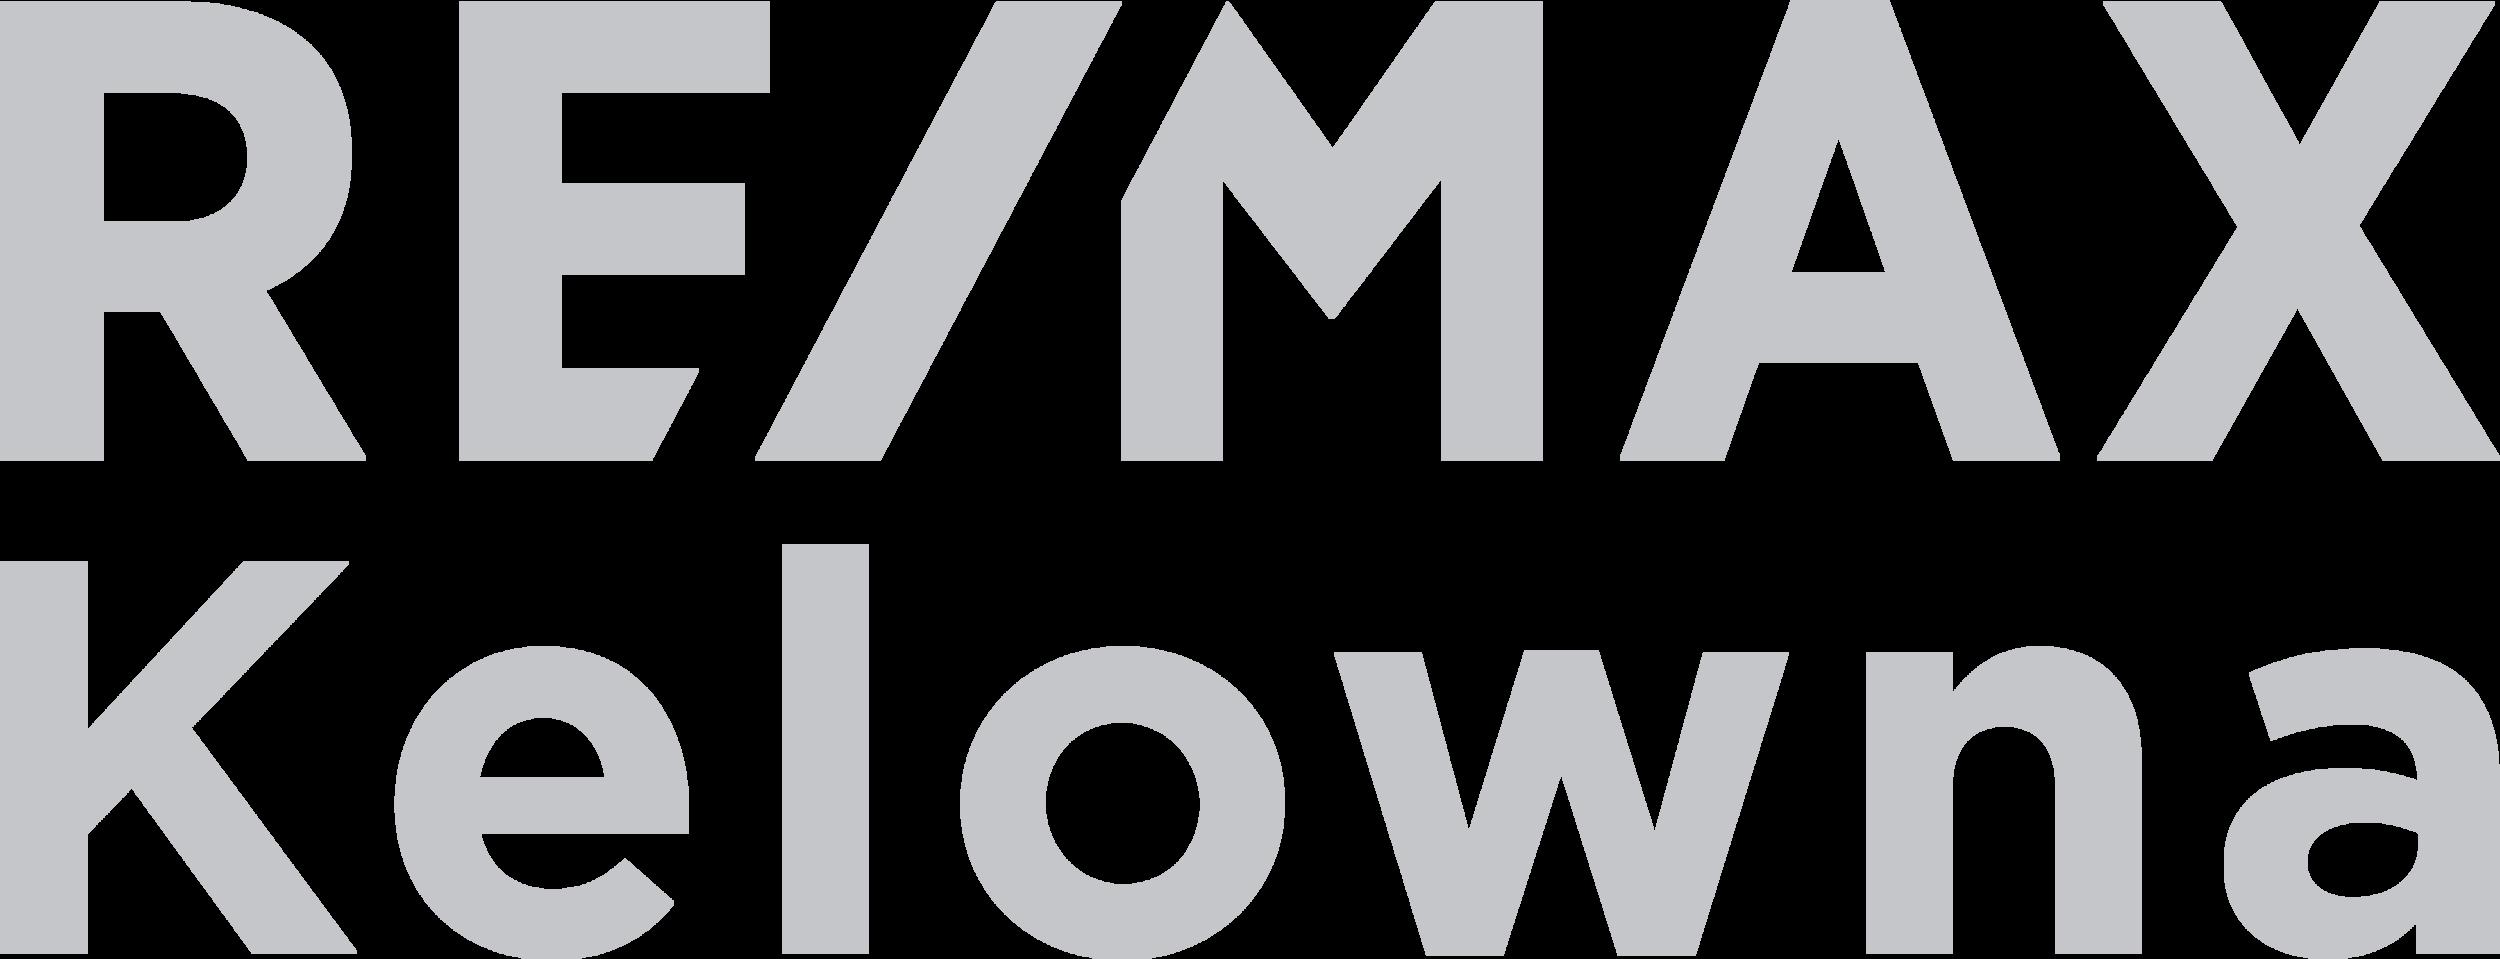 REMAX-Kelowna-logo-joshua-elliott.png